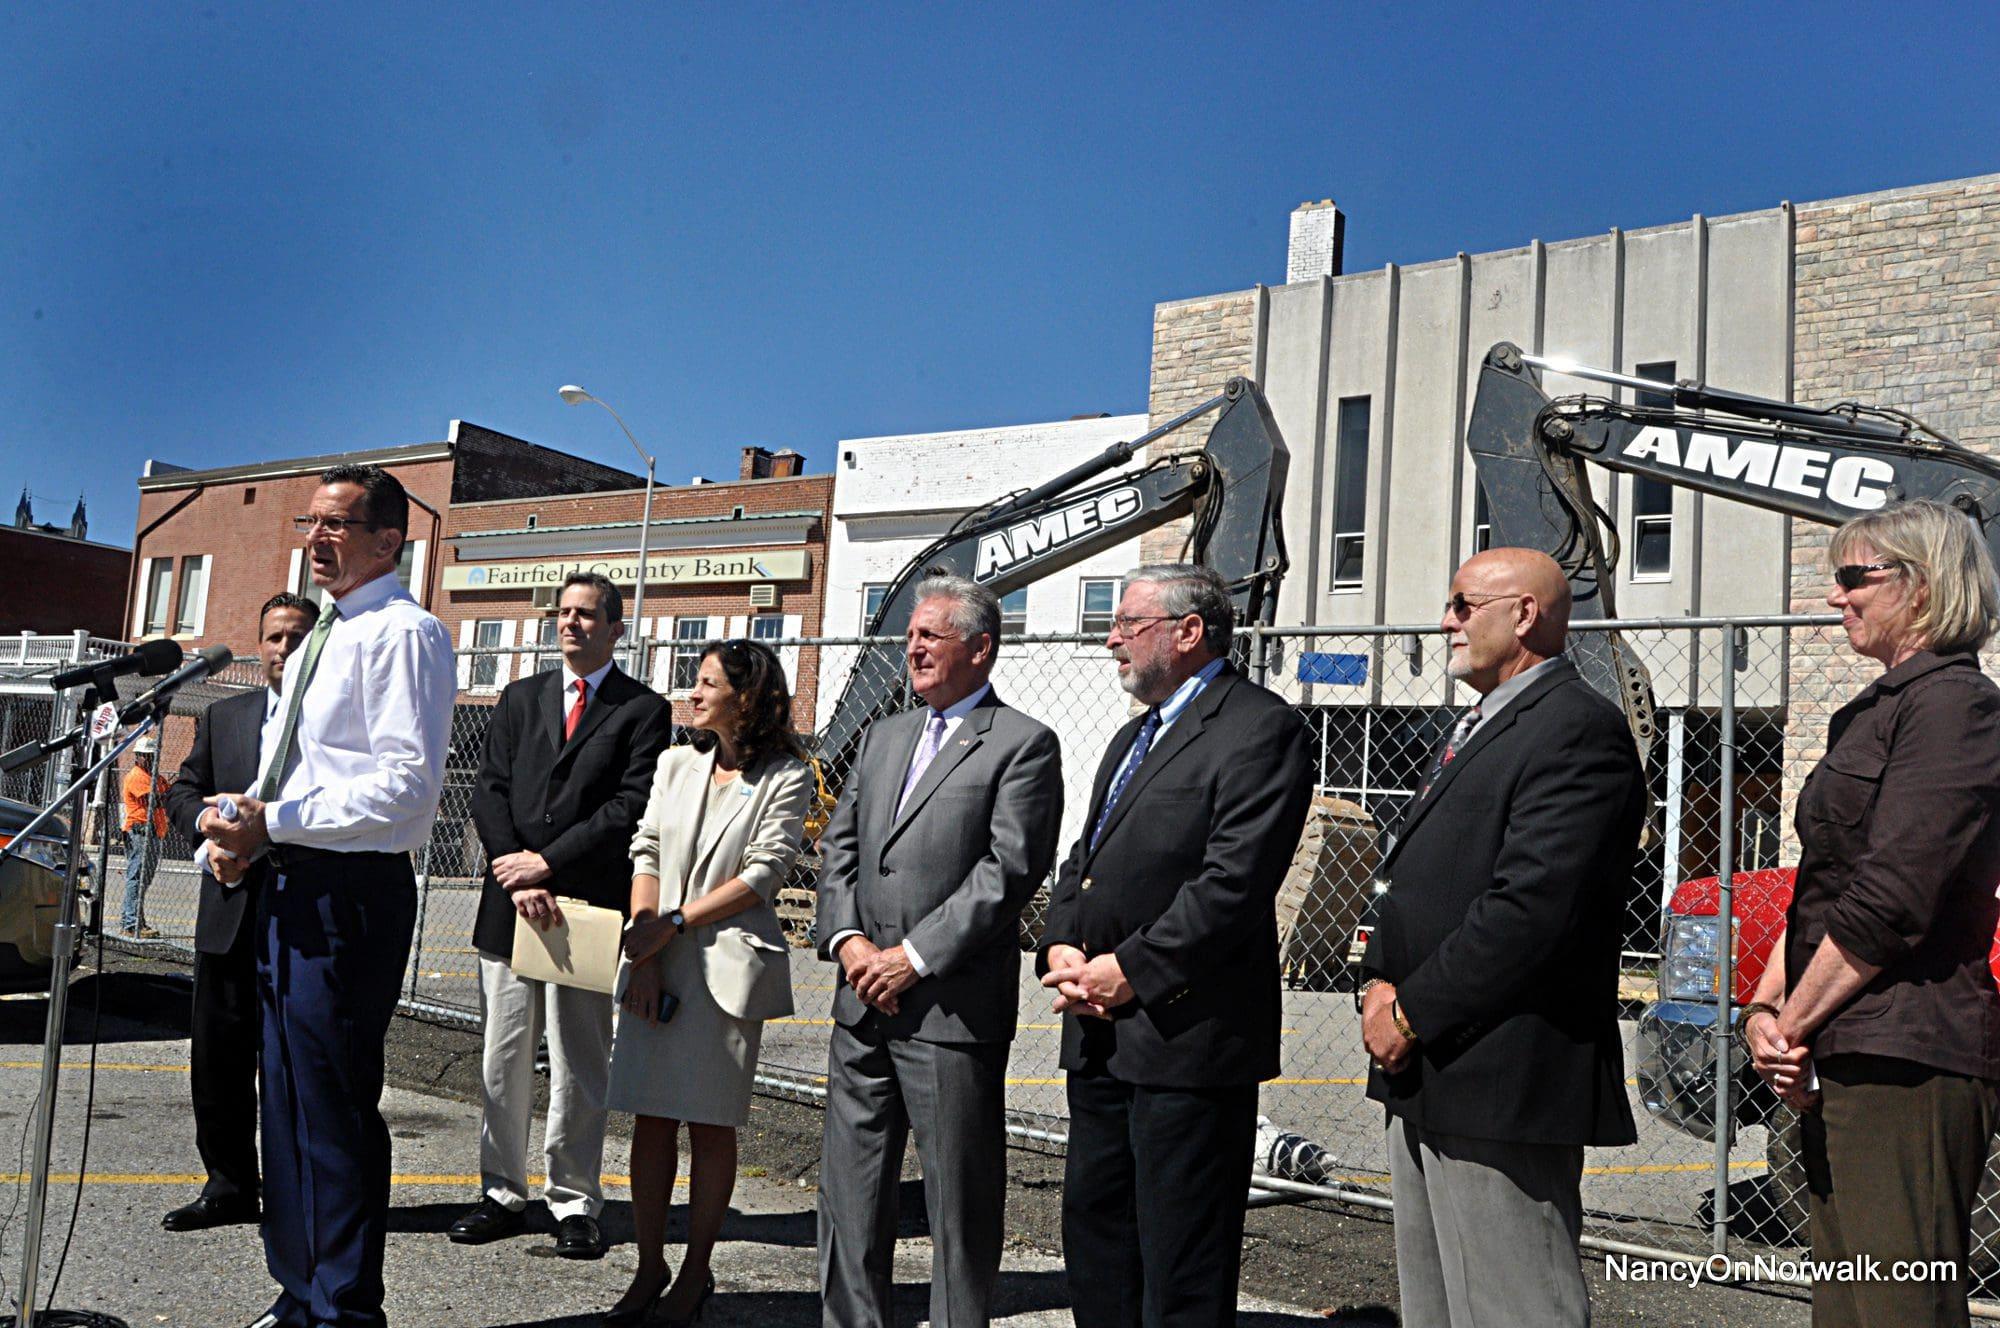 Nancy on Norwalk | News coverage that shines a light on Norwalk, CT